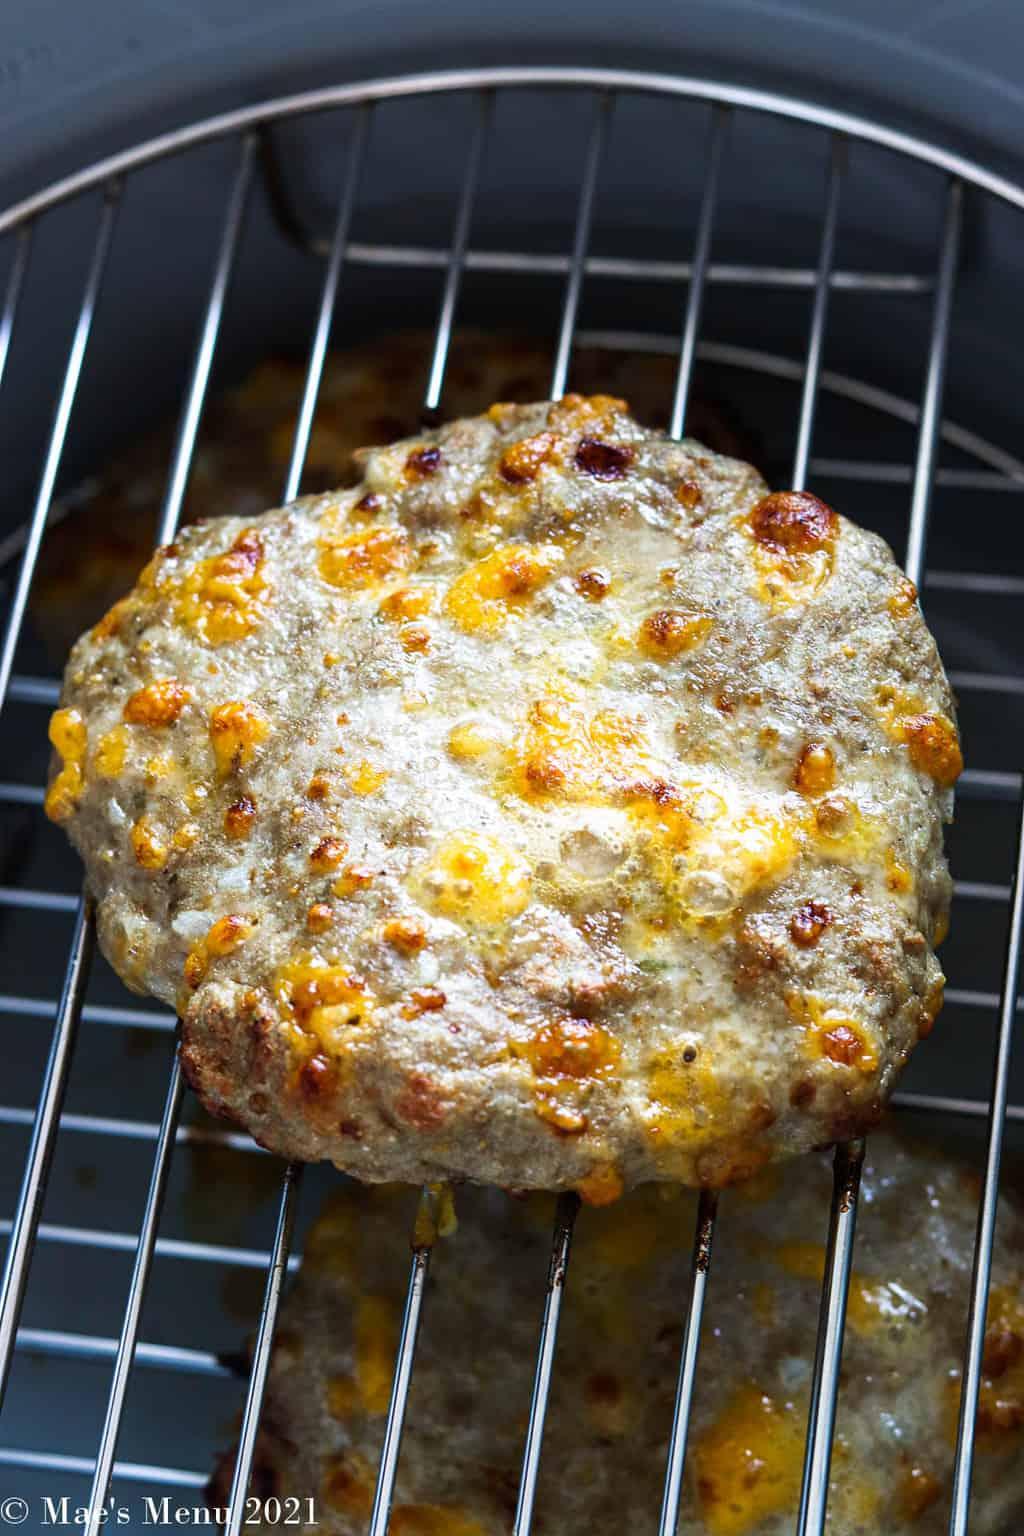 An air fried turkey burger on an air frying rack